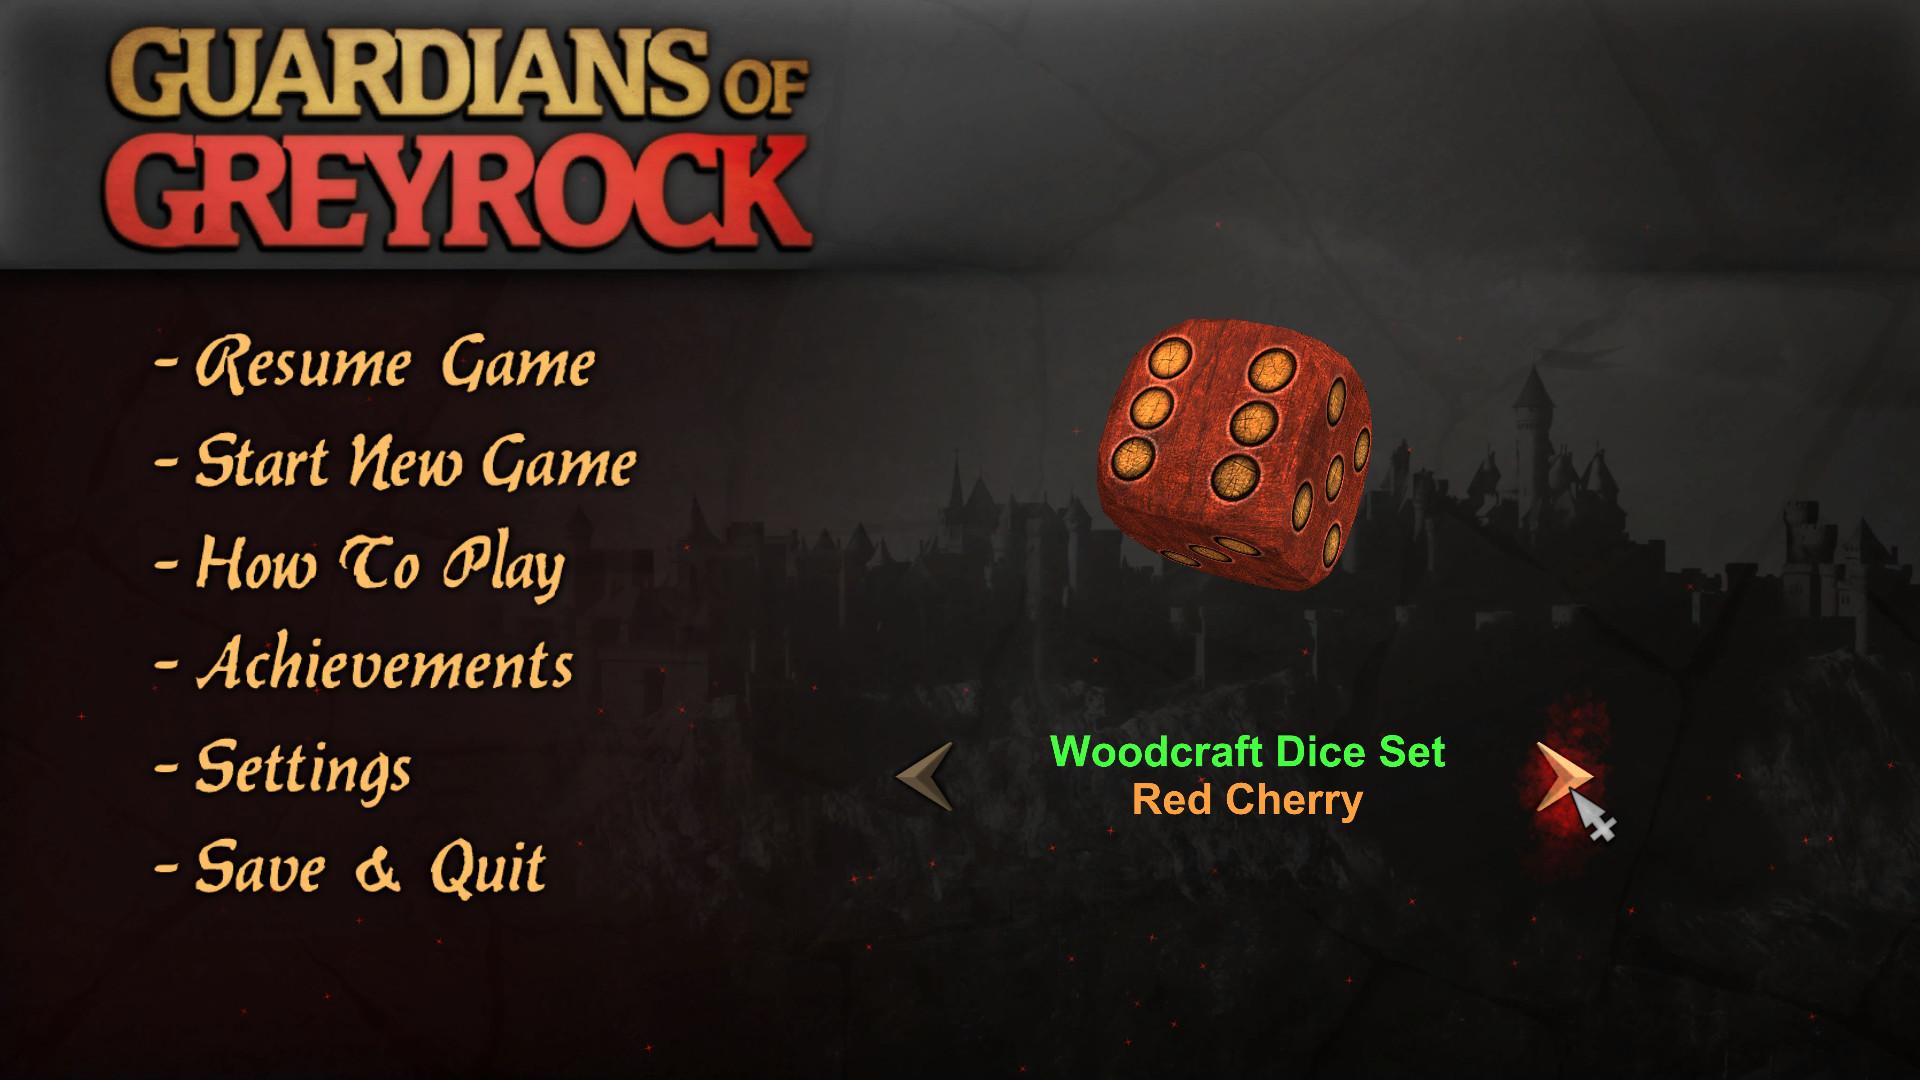 Guardians of Greyrock - Dice Pack: Woodcraft Set screenshot